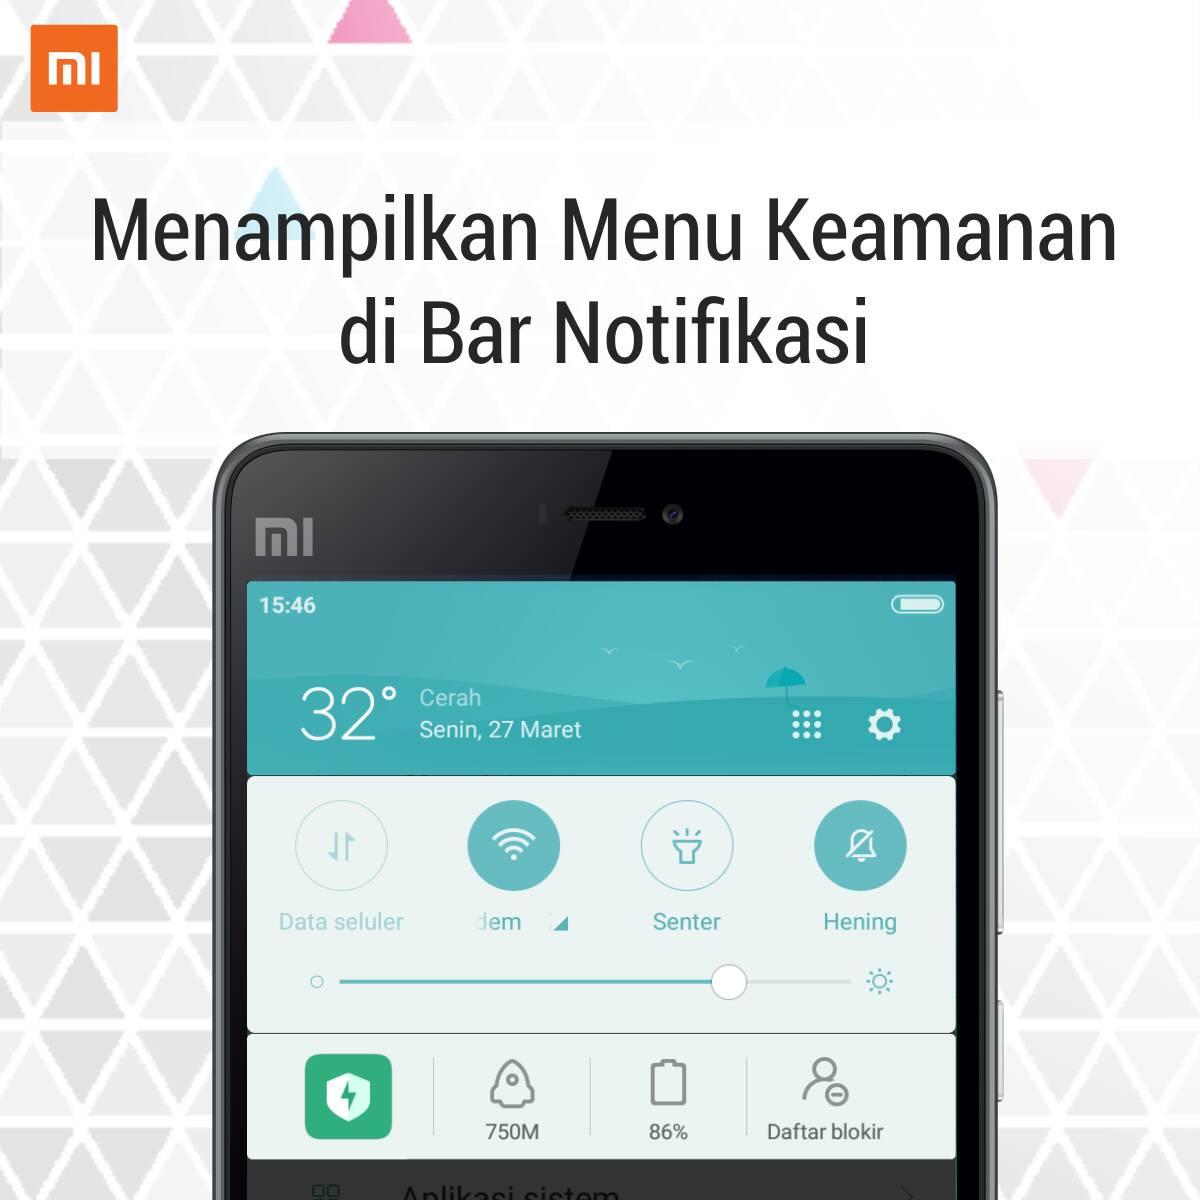 Cara Menampilkan Menu Keamanan Di Bar Notifikasi Hp Xiaomi Bali